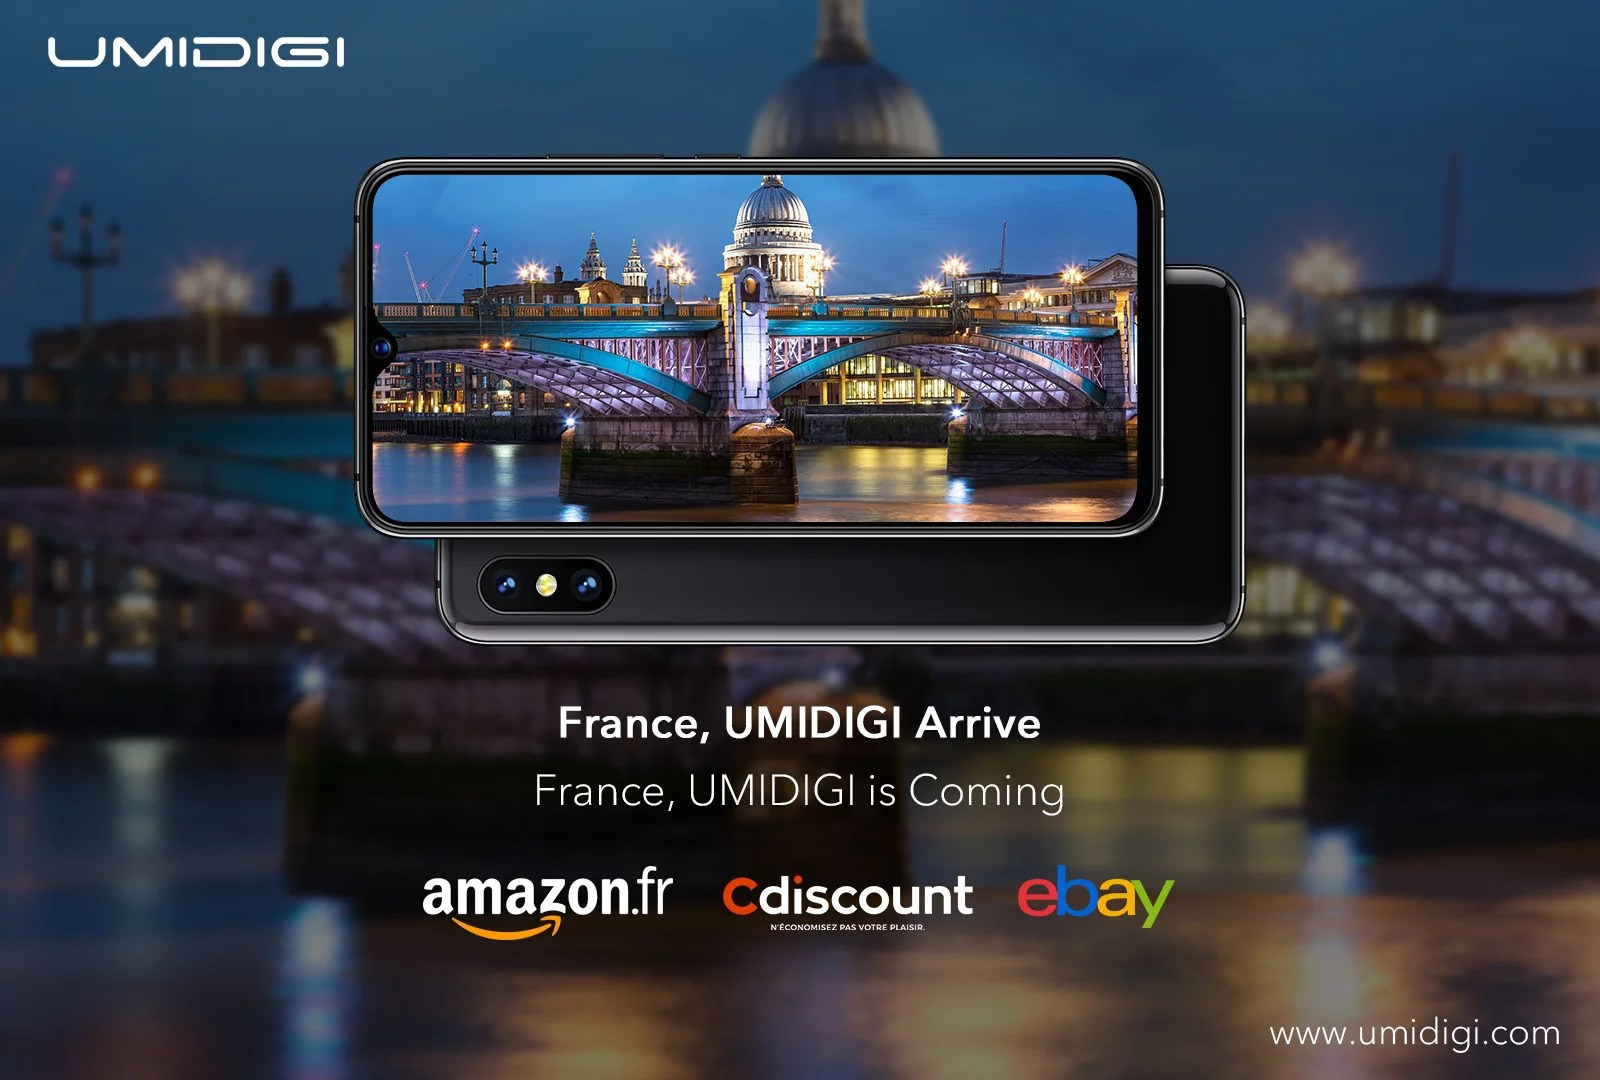 UMIDIGI arrive officiellement en France